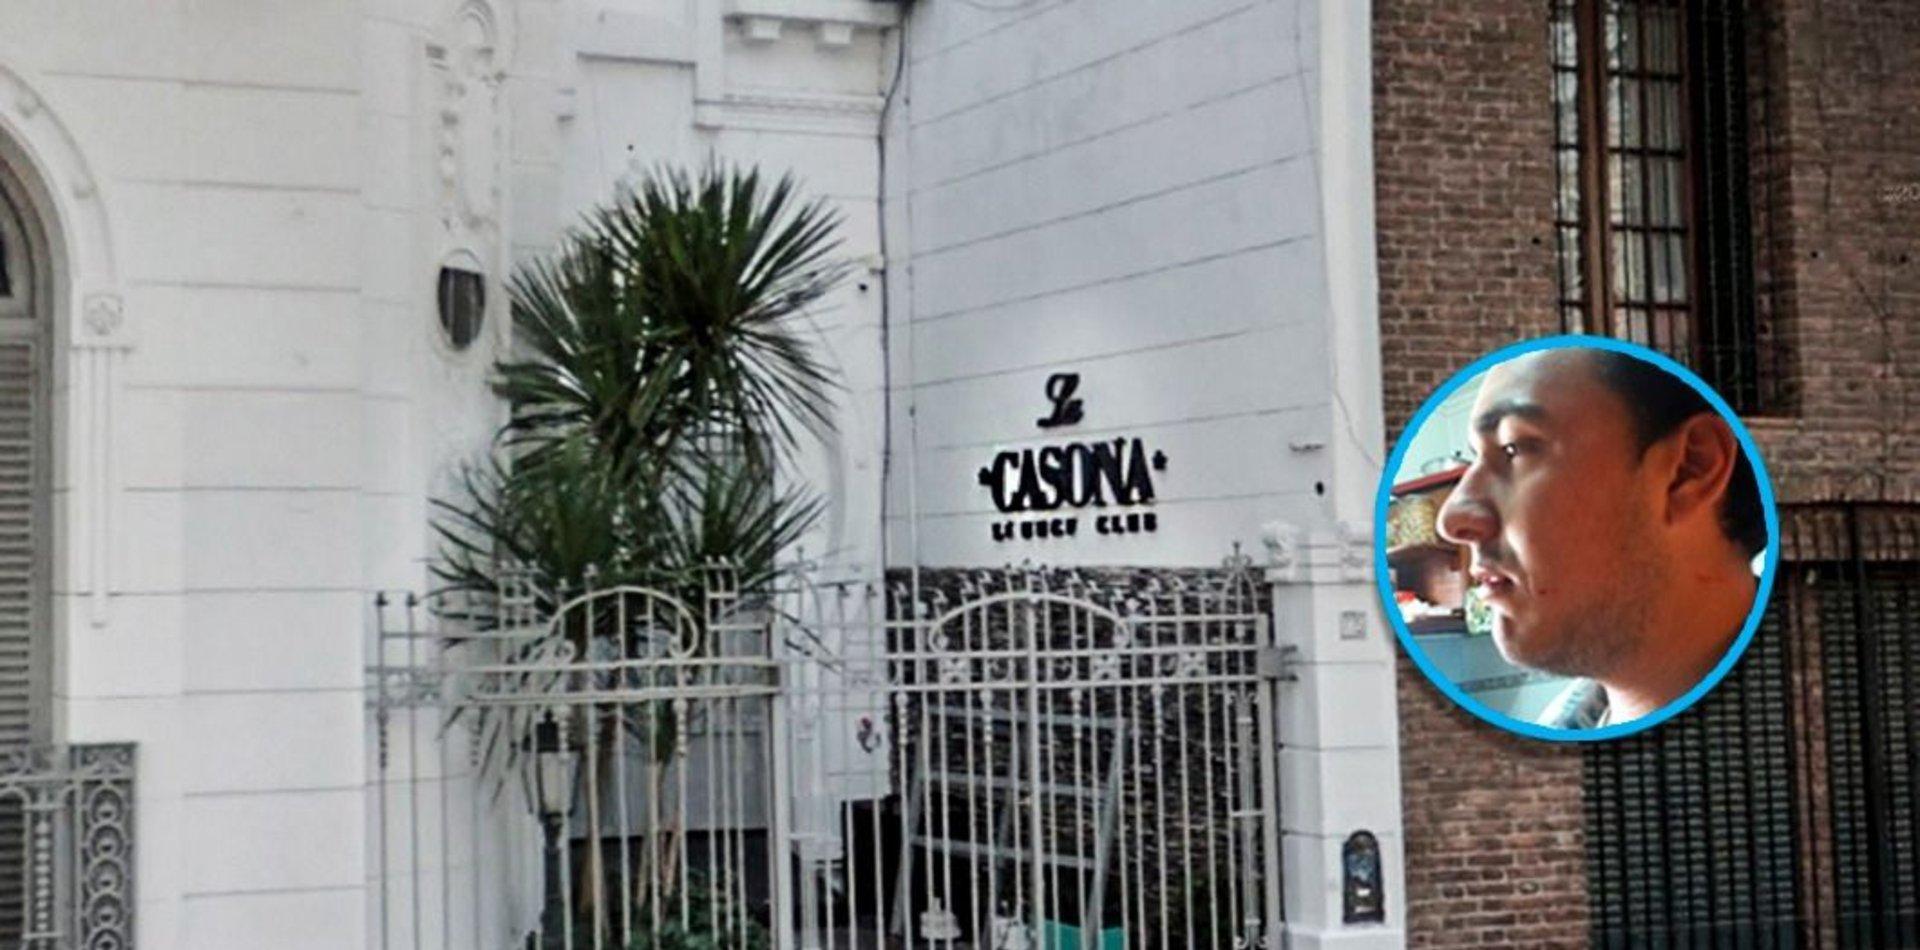 Feroz ataque de patovicas a un periodista en La Plata